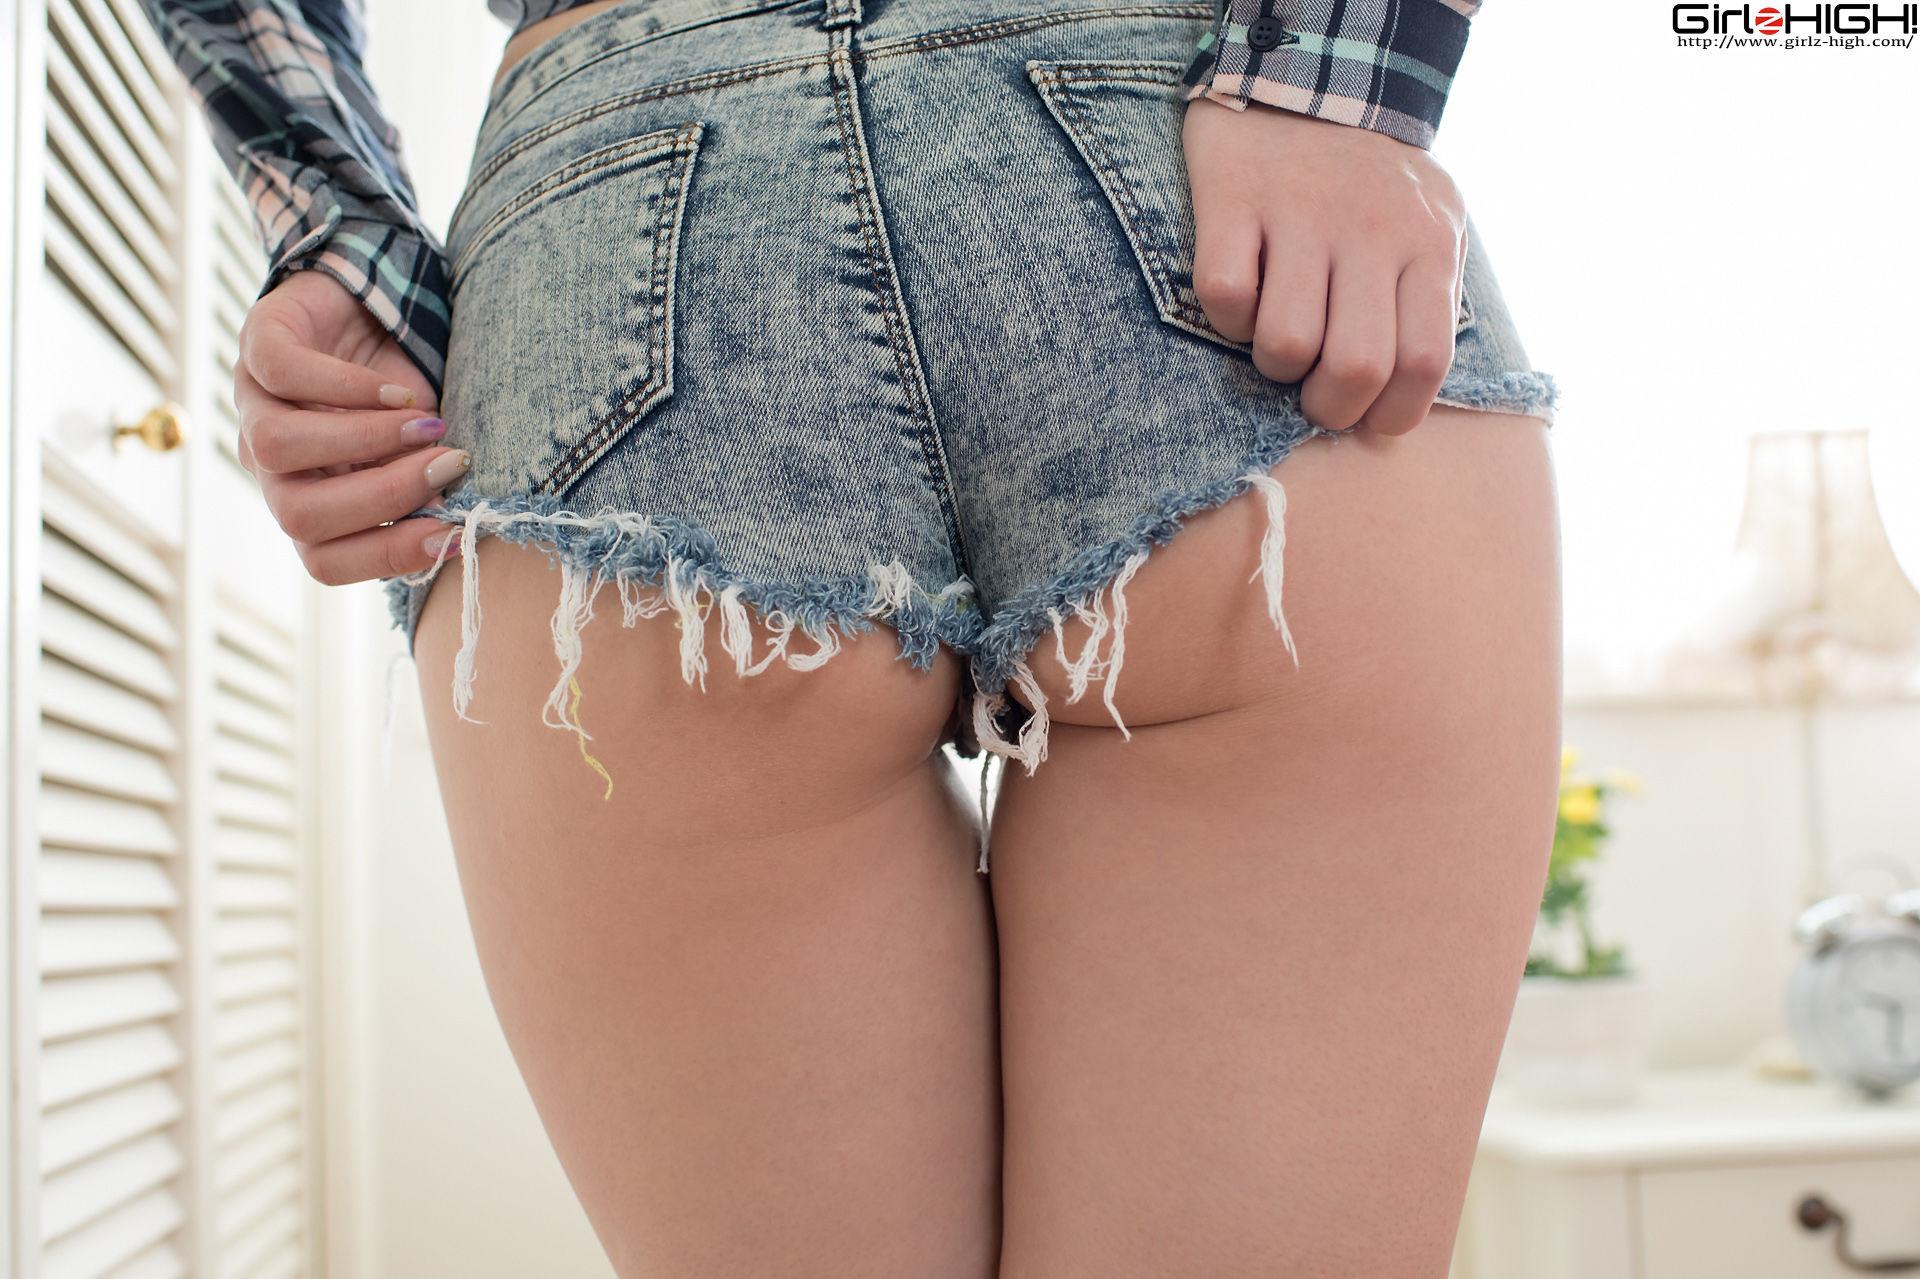 VOL.574 [Girlz-High]热裤牛仔:葉山みおり超高清写真套图(50P)